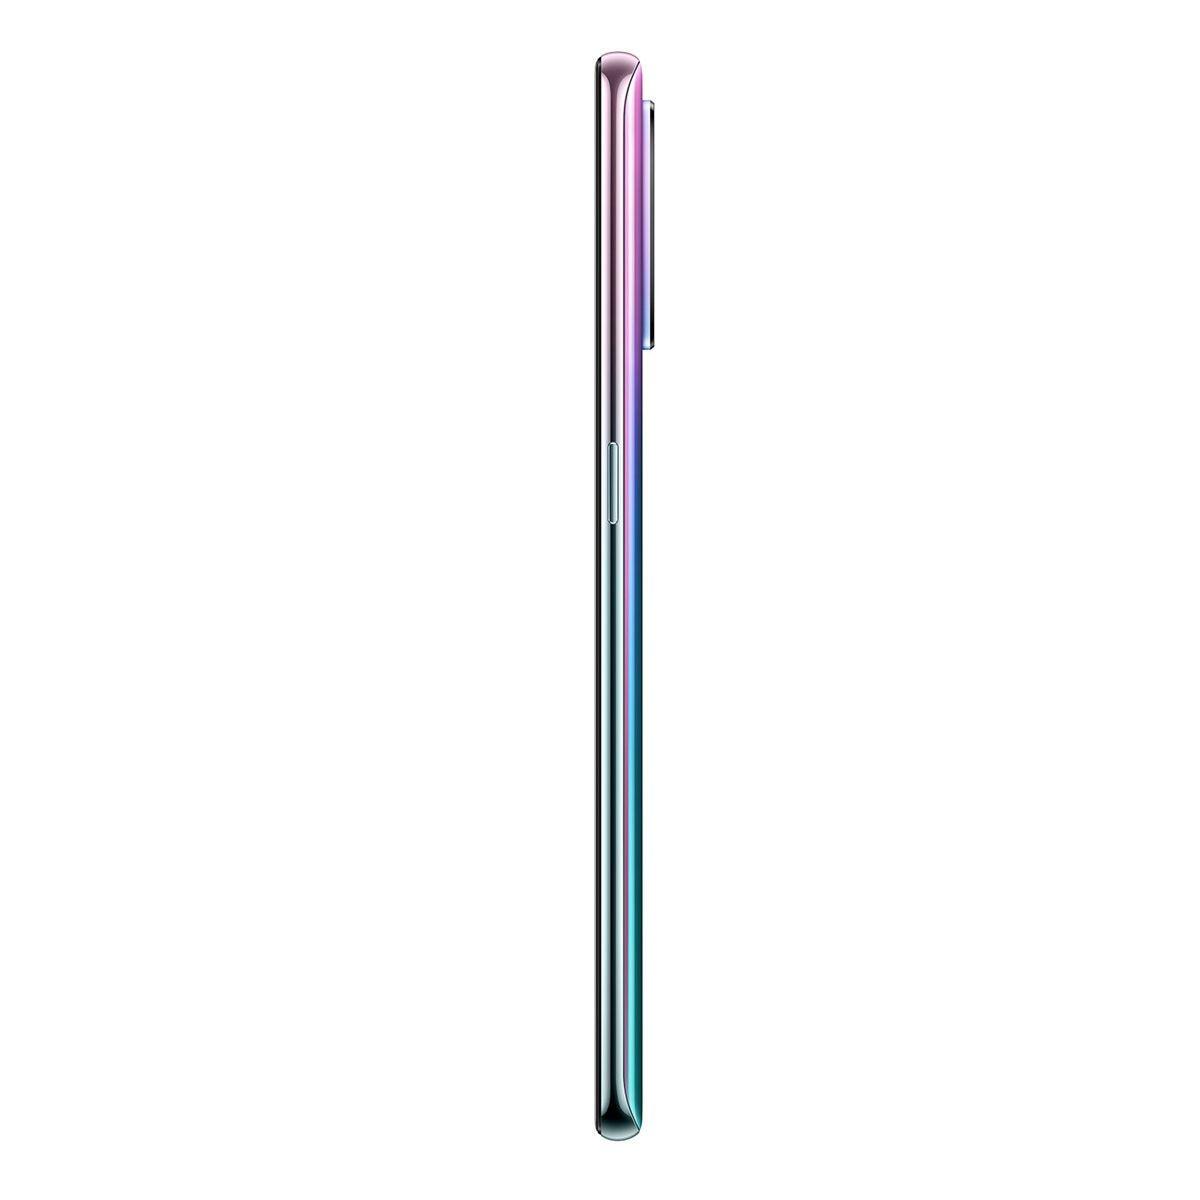 Oppo Reno 5 Lite 128GB Violeta Telcel R9